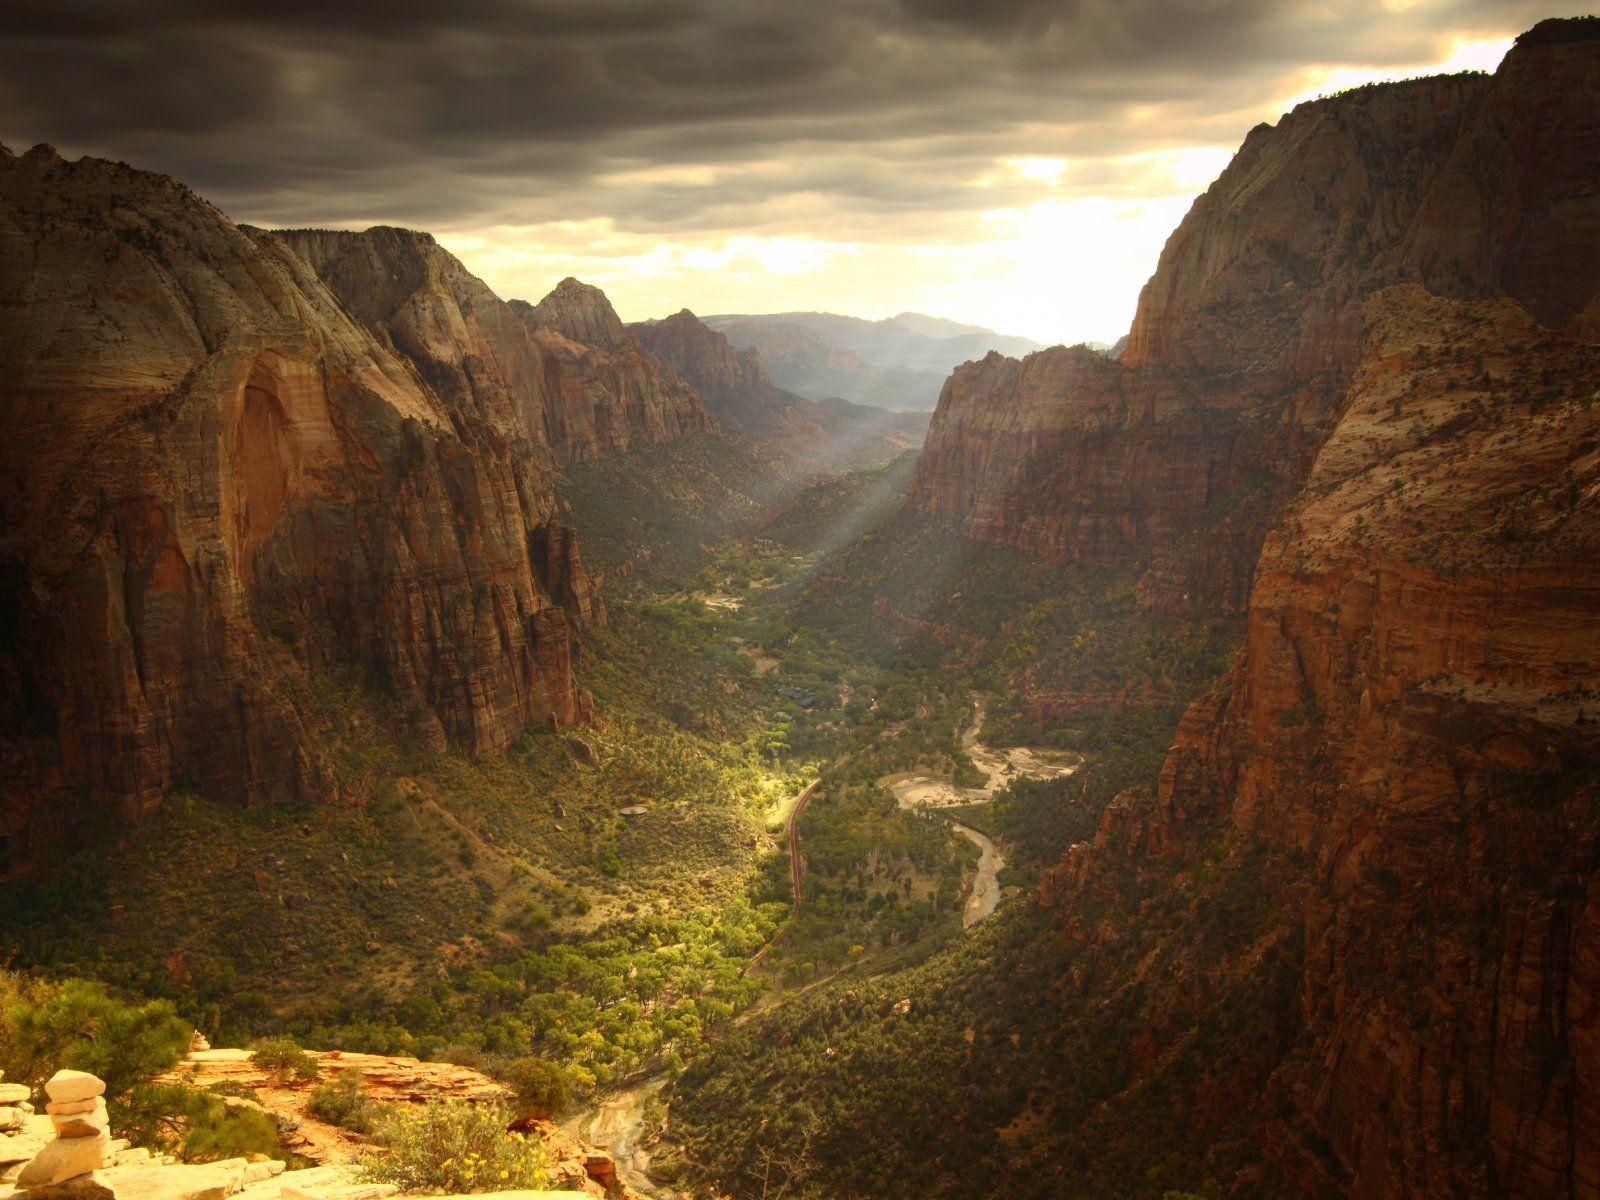 photos of canyons | sfondi canyon, gola, le montagne, l'altezza, il sole, cielo, tramonto ...